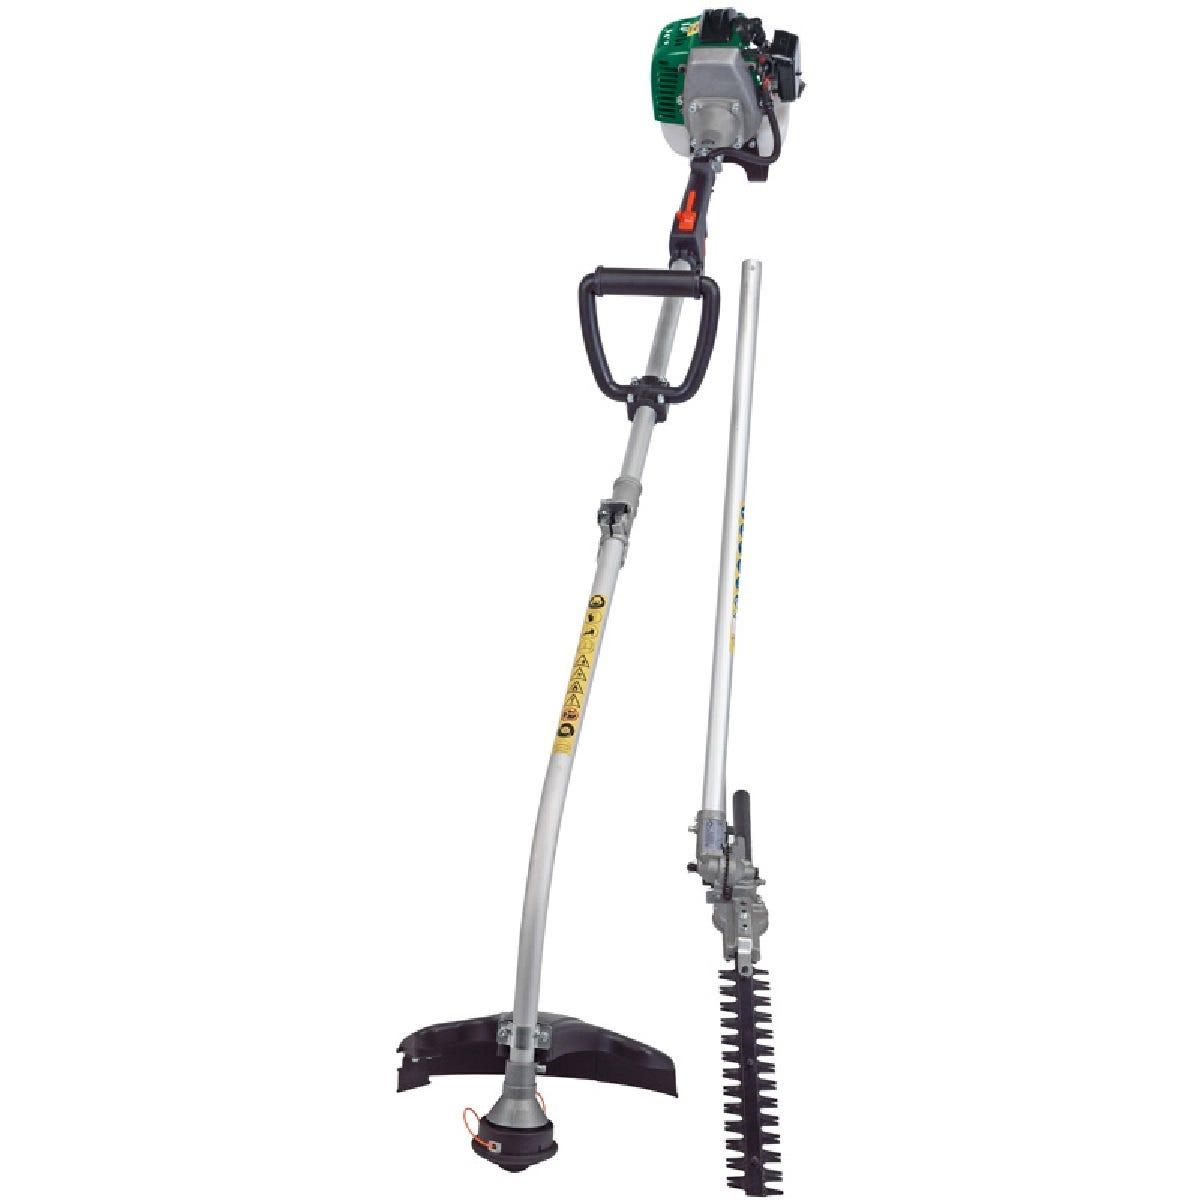 Draper 2-in-1 Petrol Garden Tool - Grass & Hedge Trimmer (33cc)